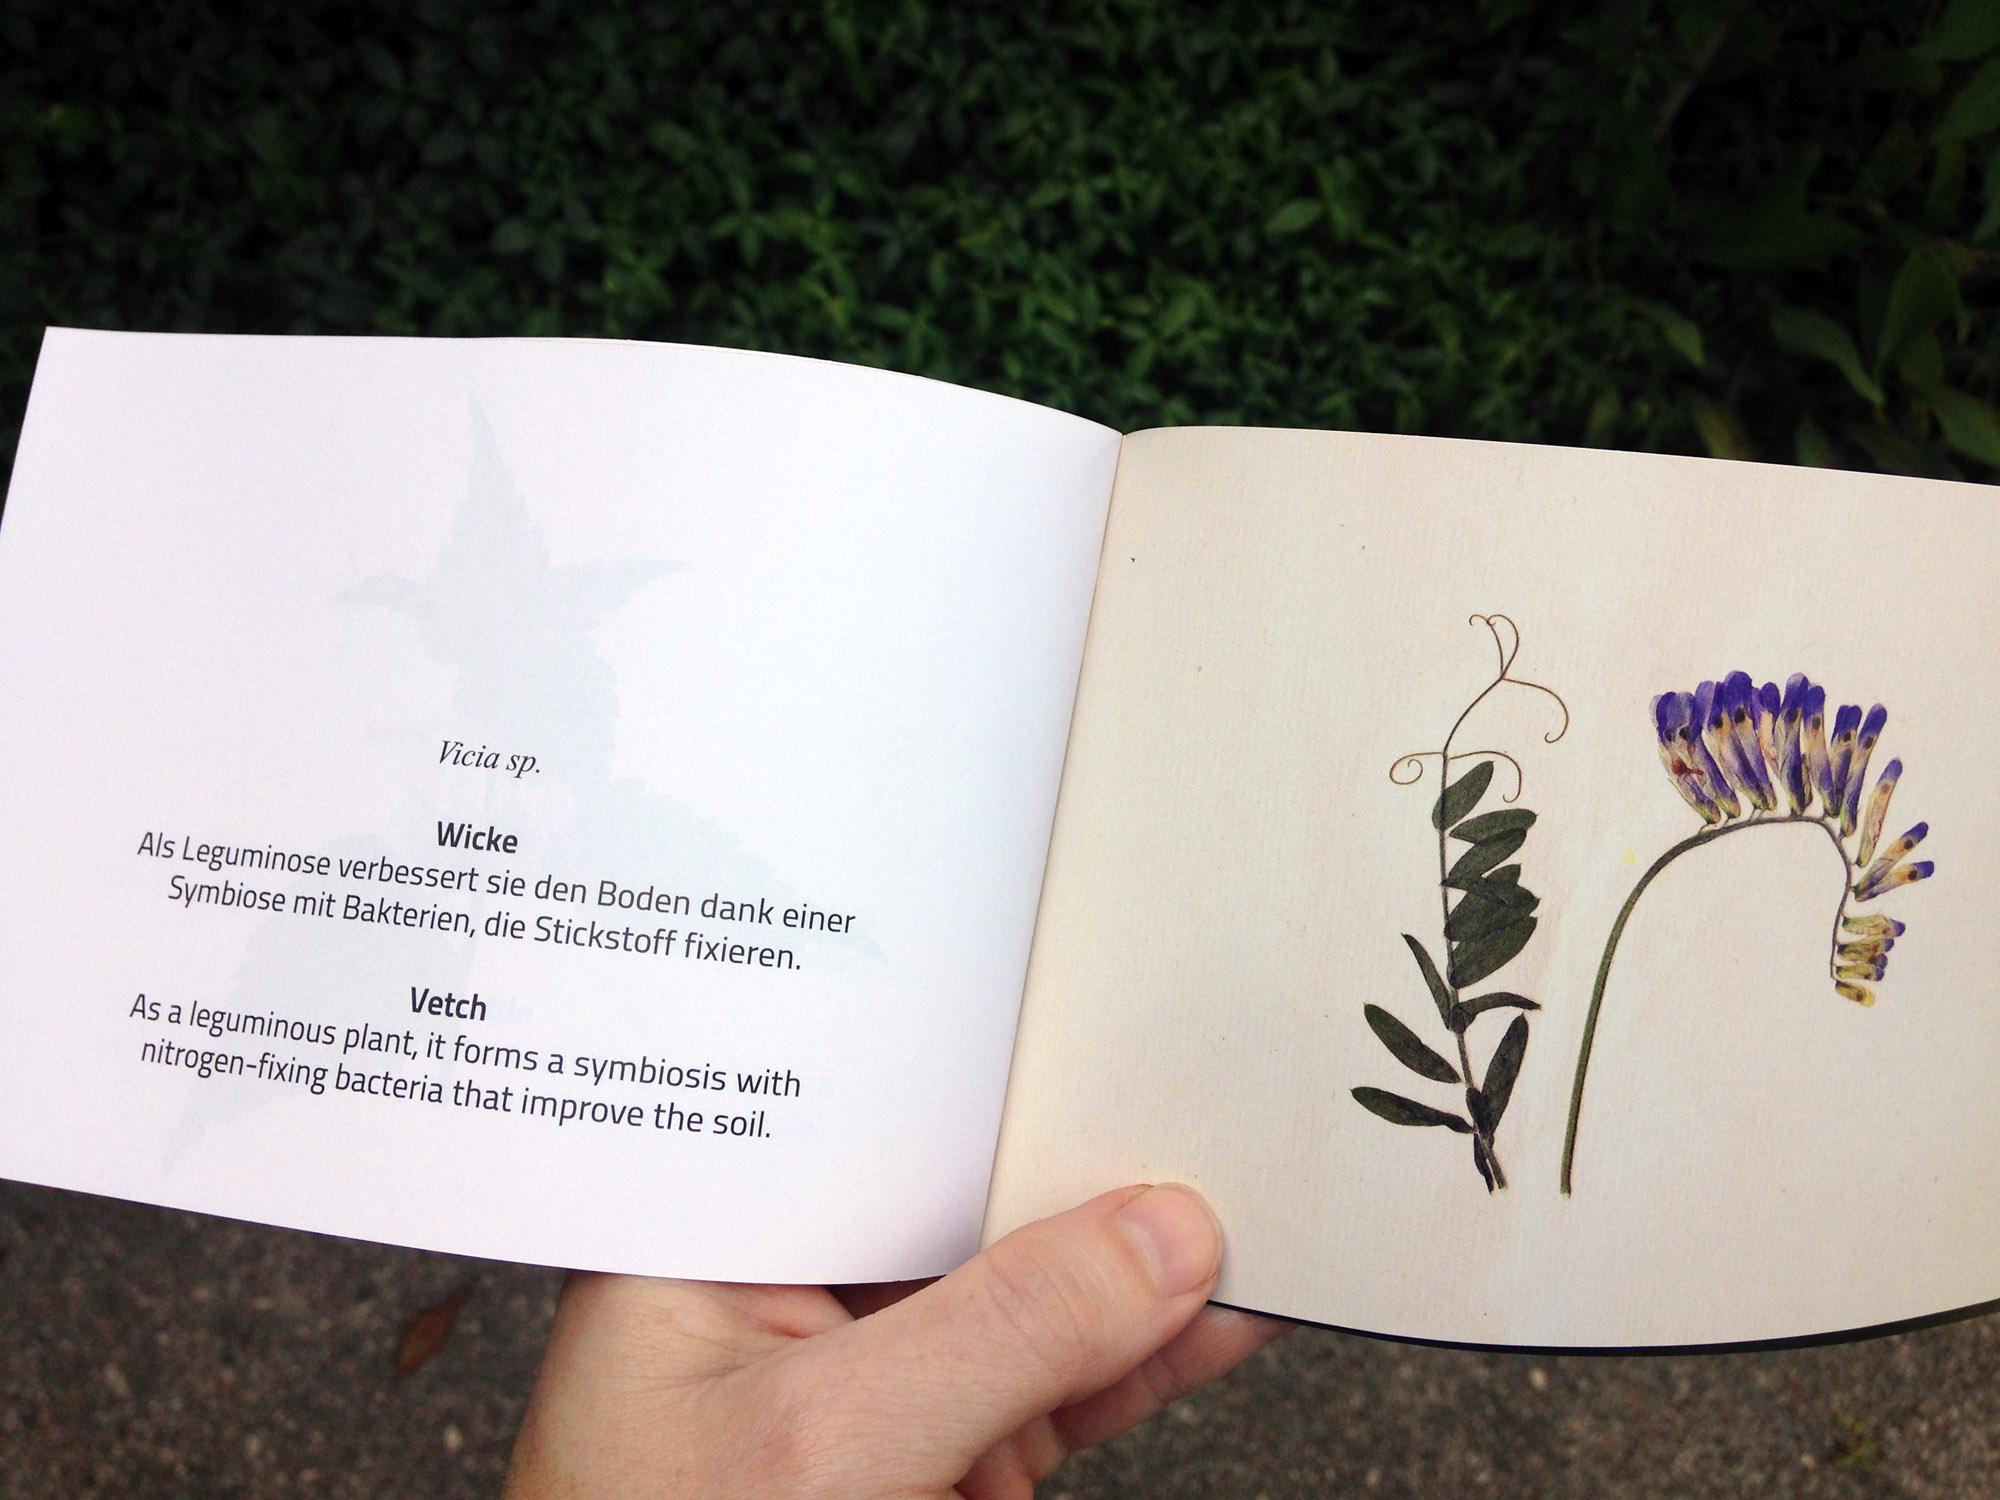 12_Herbarium-Vetch.jpg